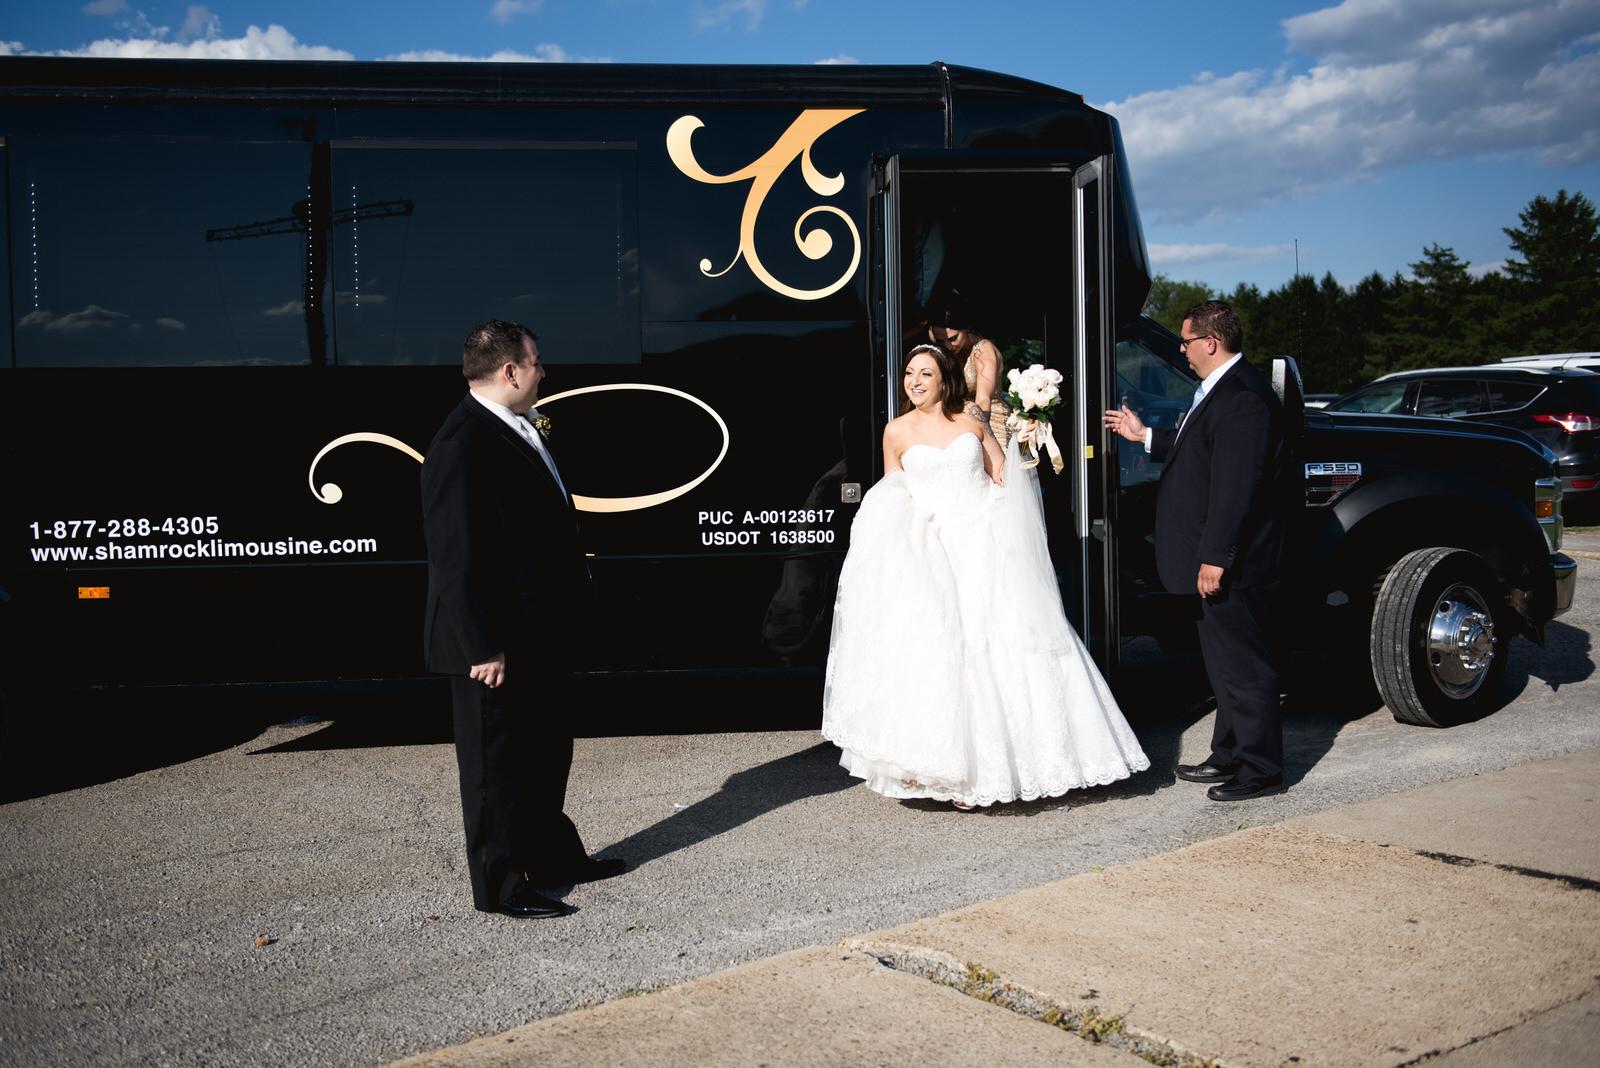 Laube_Banquet_Hall__Wedding_Photos_065.jpg